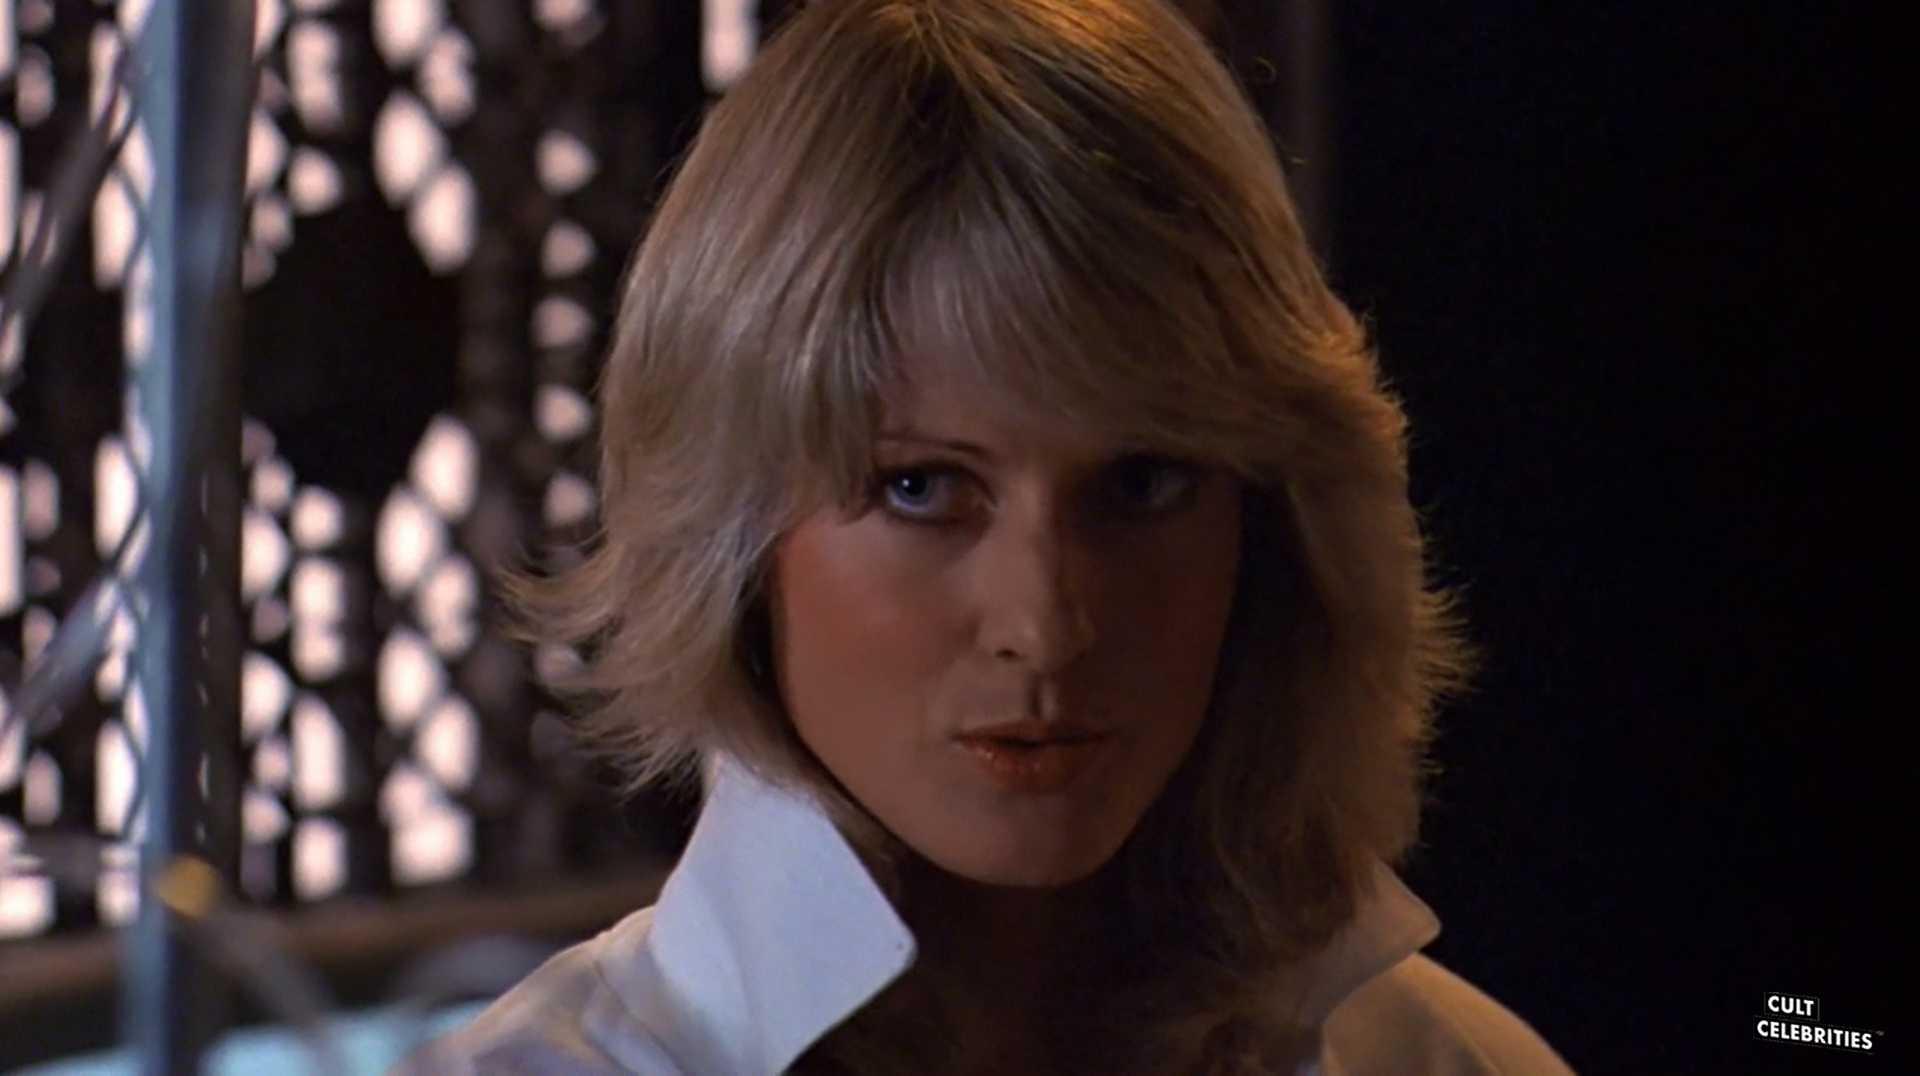 June Chadwick in Forbidden World (1982)